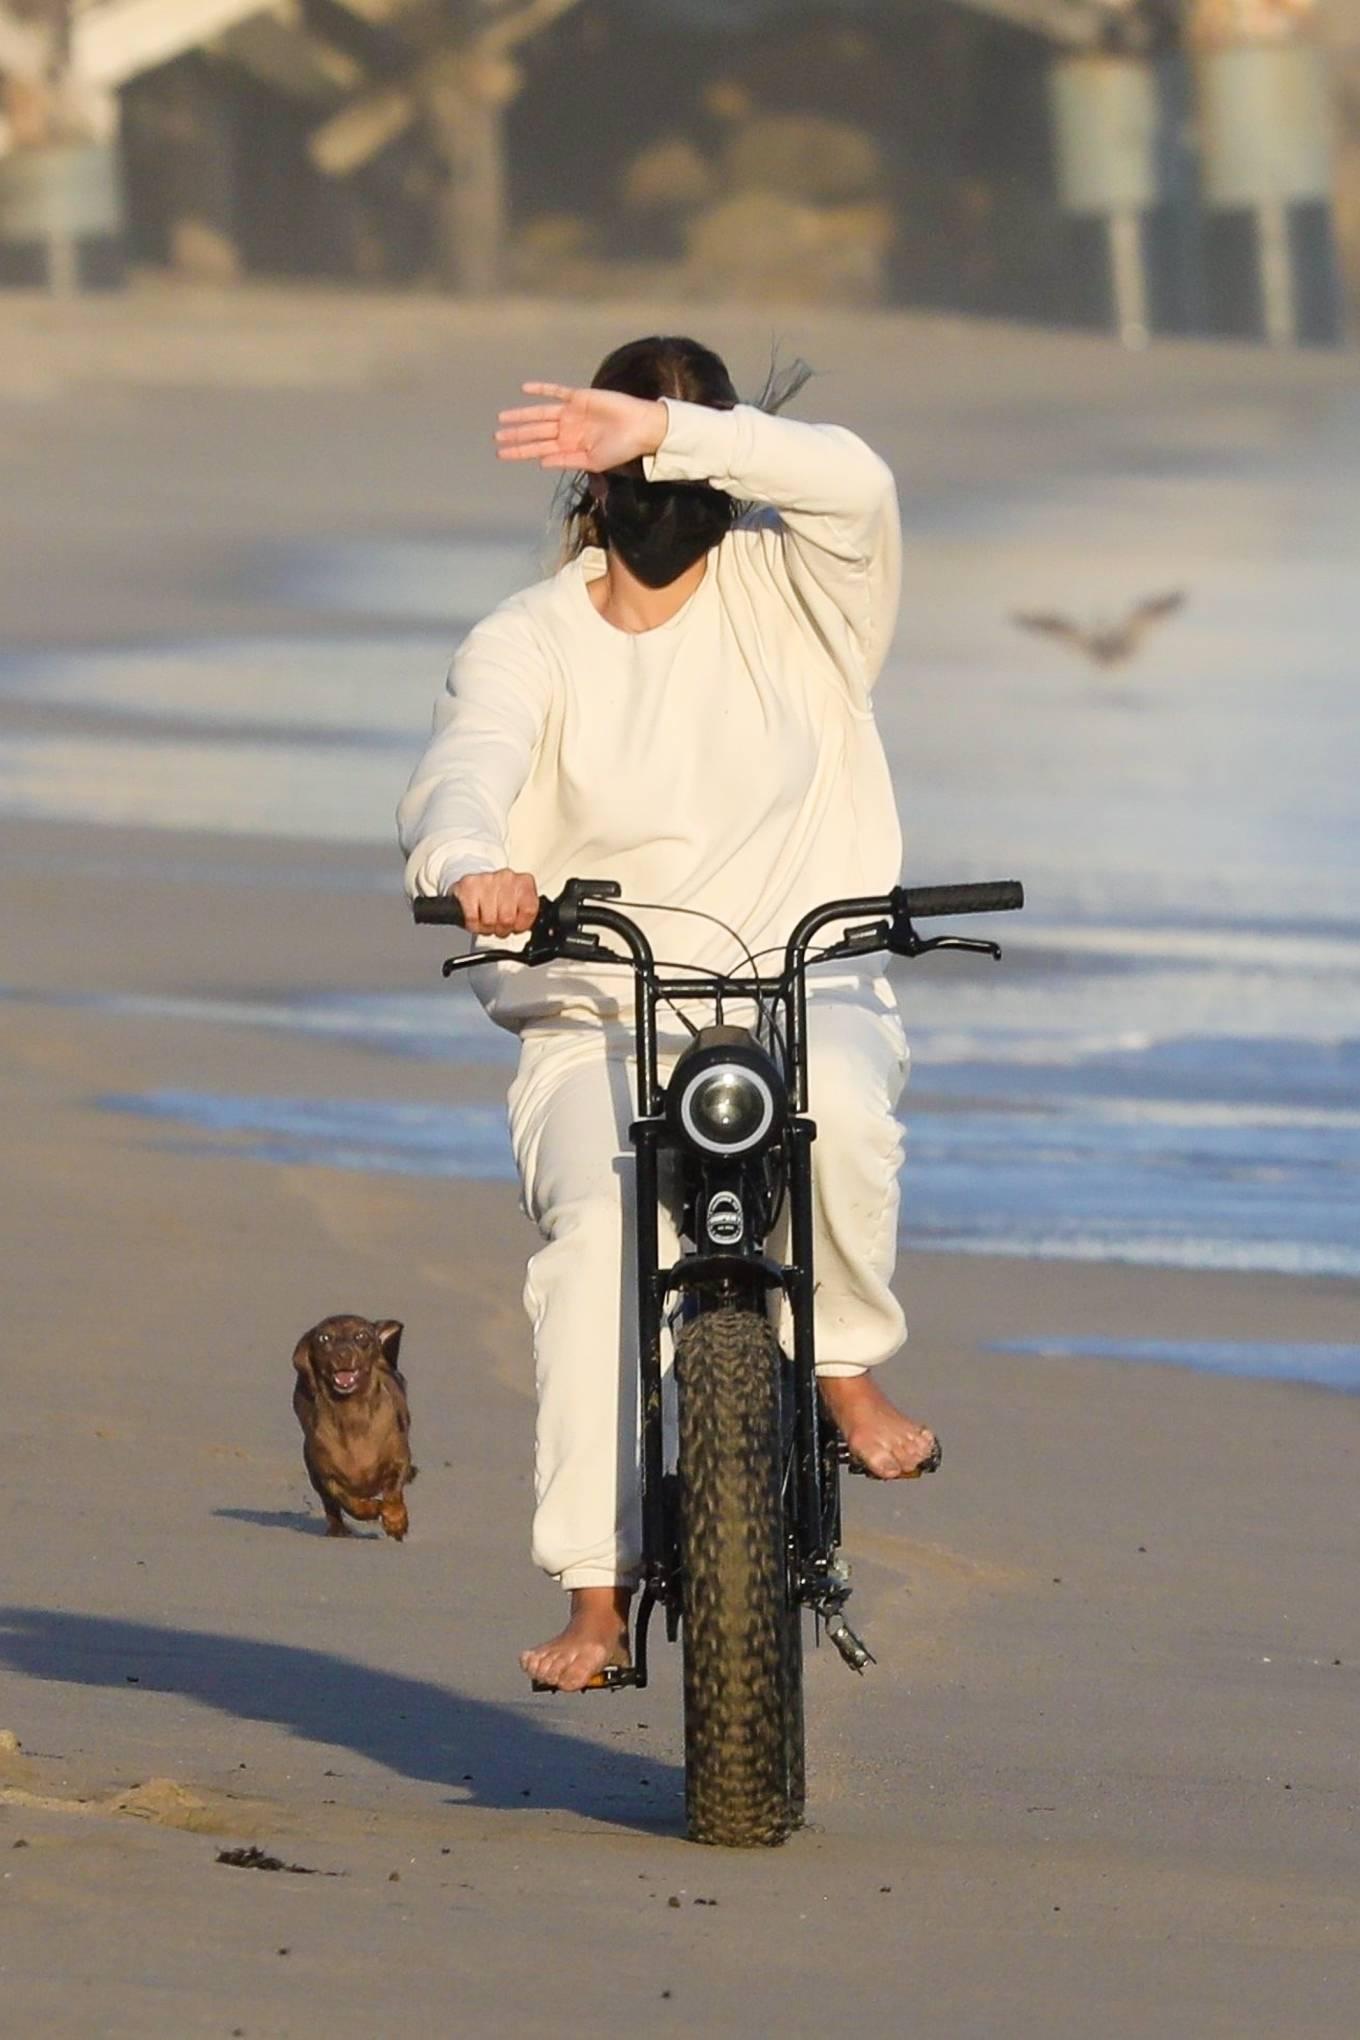 Sofia Richie - Riding motorbike on the beach in Malibu